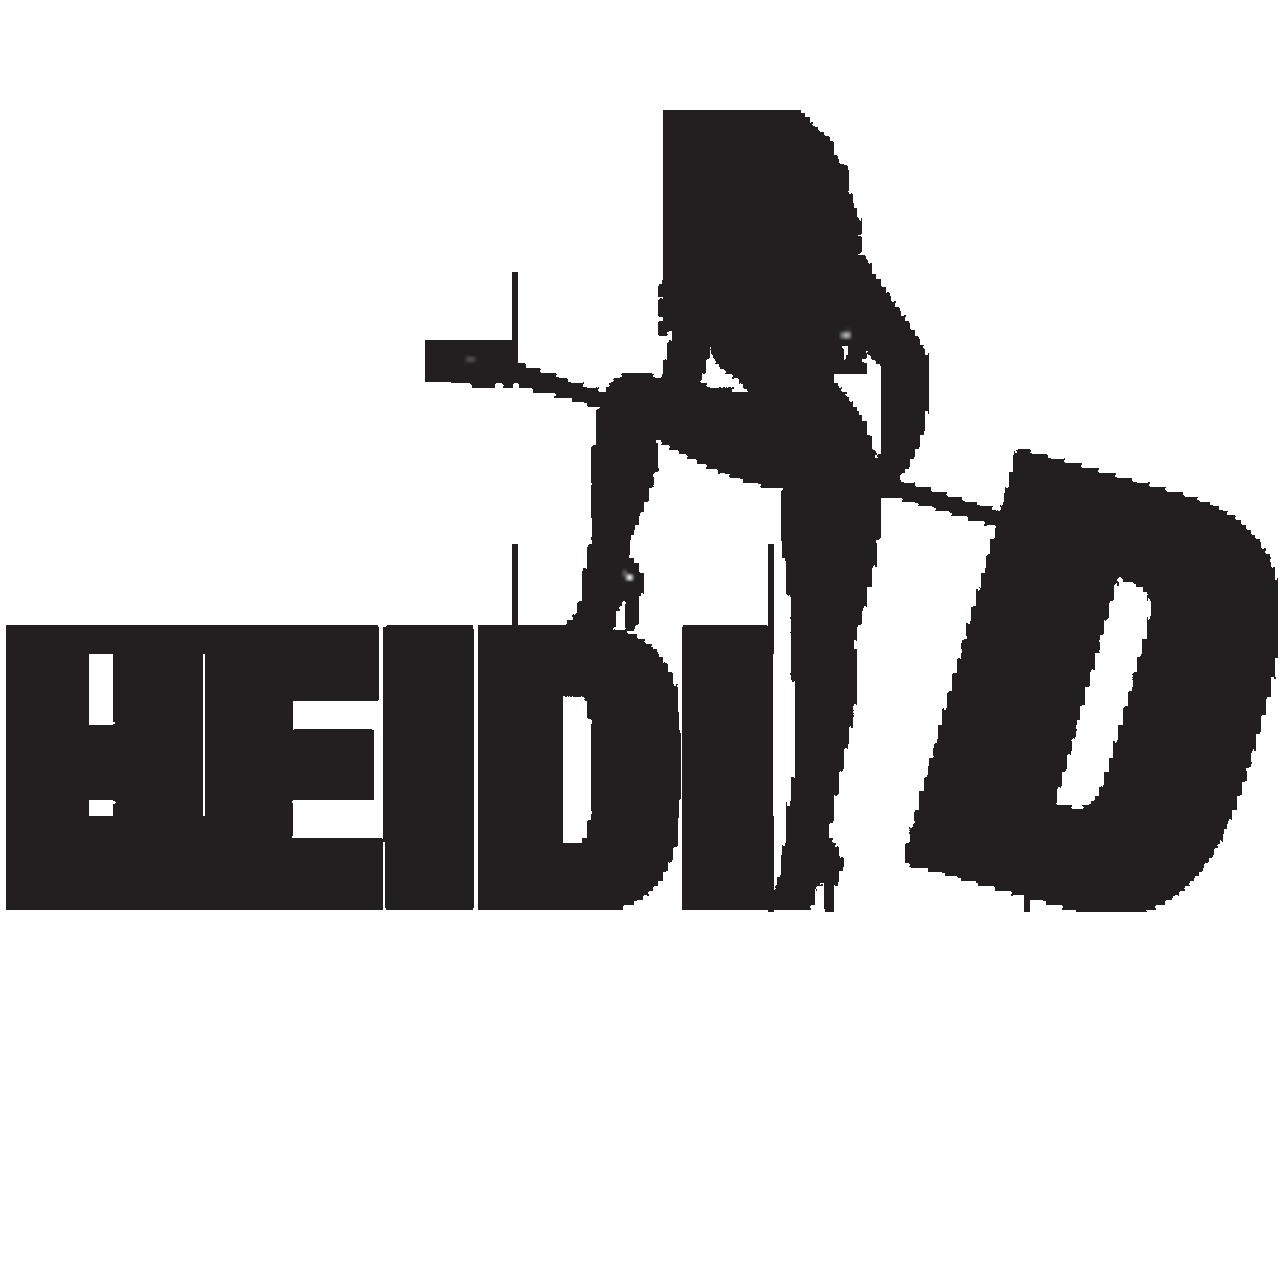 Official Heidi D Website